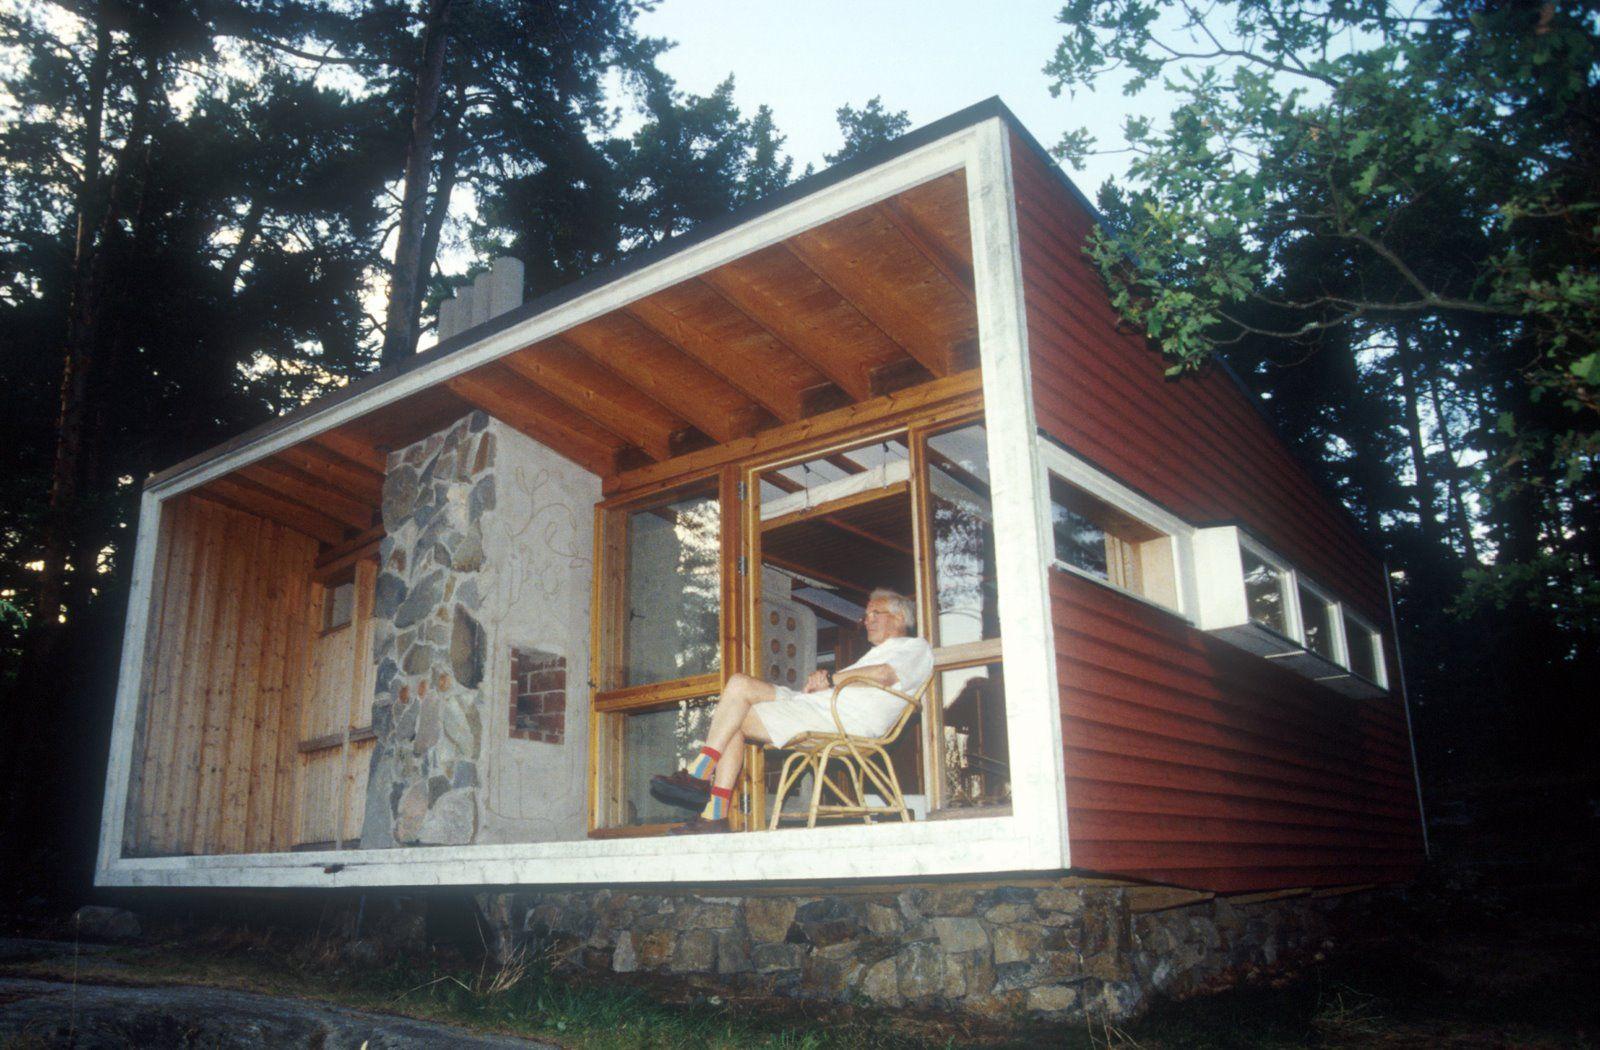 arquitectoortiz: The Box-Ralph Erskine-. | Casas, Casas de playa modernas,  Construccion de cabañas